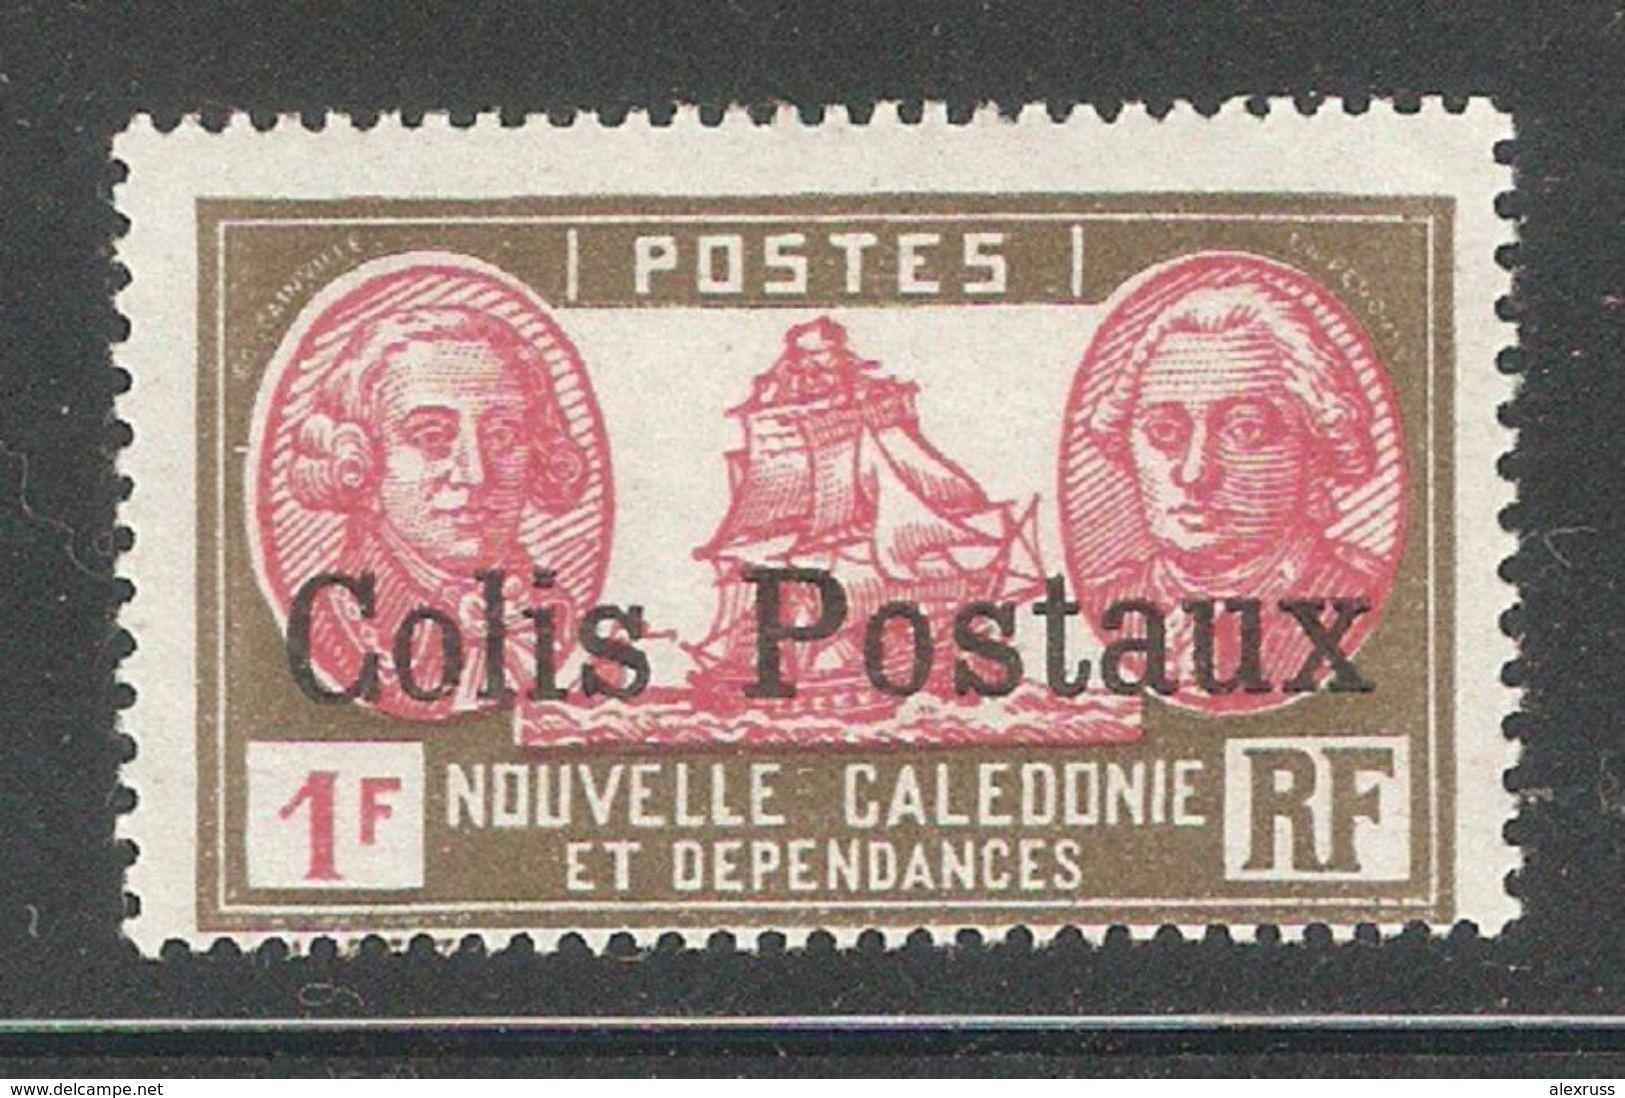 New Caledonia 1930,1fr Colis Parcel Post,Sc Q5,VF Mint Hinged* (K-8) - New Caledonia